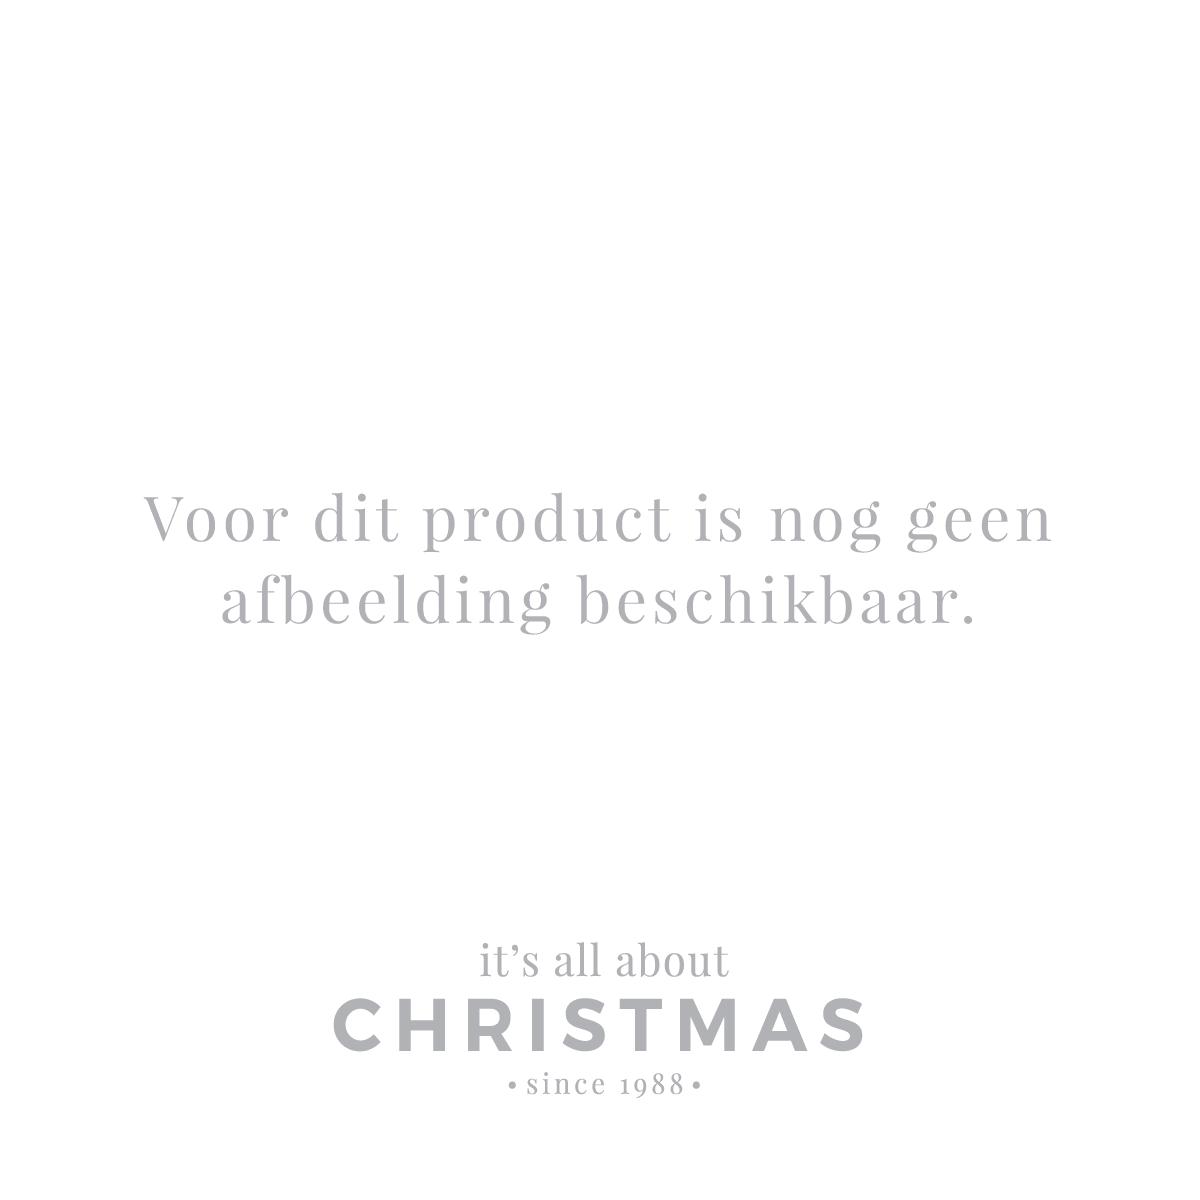 Christbaumkugeln Lila Kunststoff.24 Plastik Christbaumkugeln Lila Mix 2 5 Cm It S All About Christmas